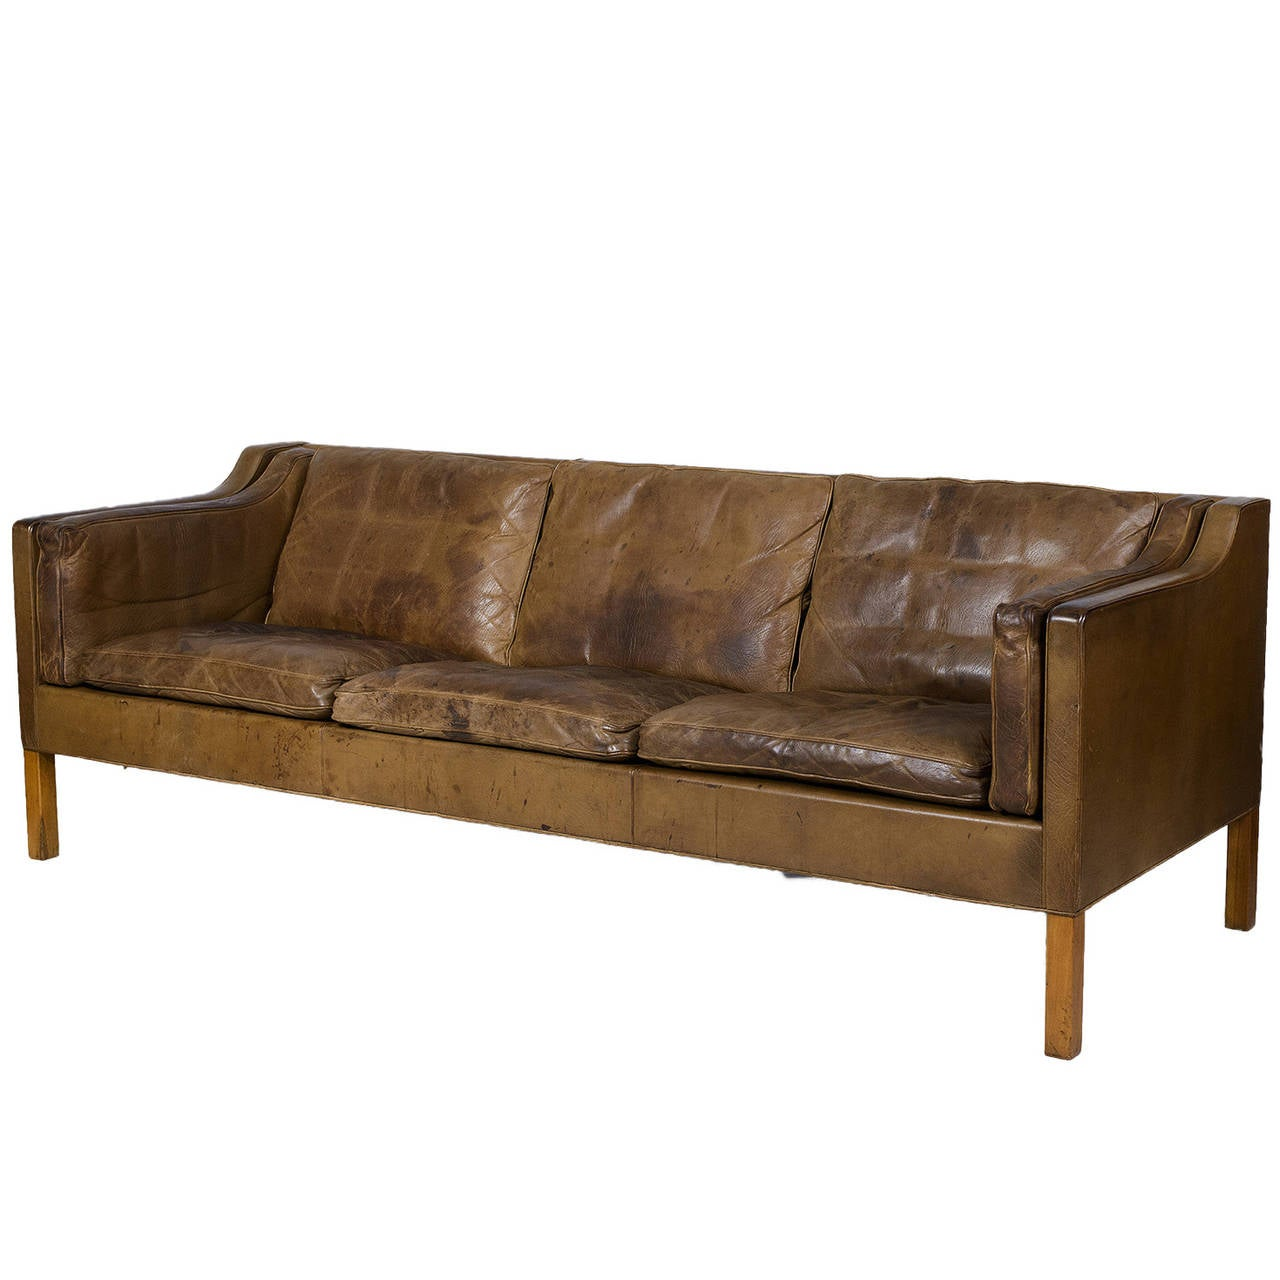 borge mogensen sofa model 2209 soft leather bed 2213 three seat at 1stdibs